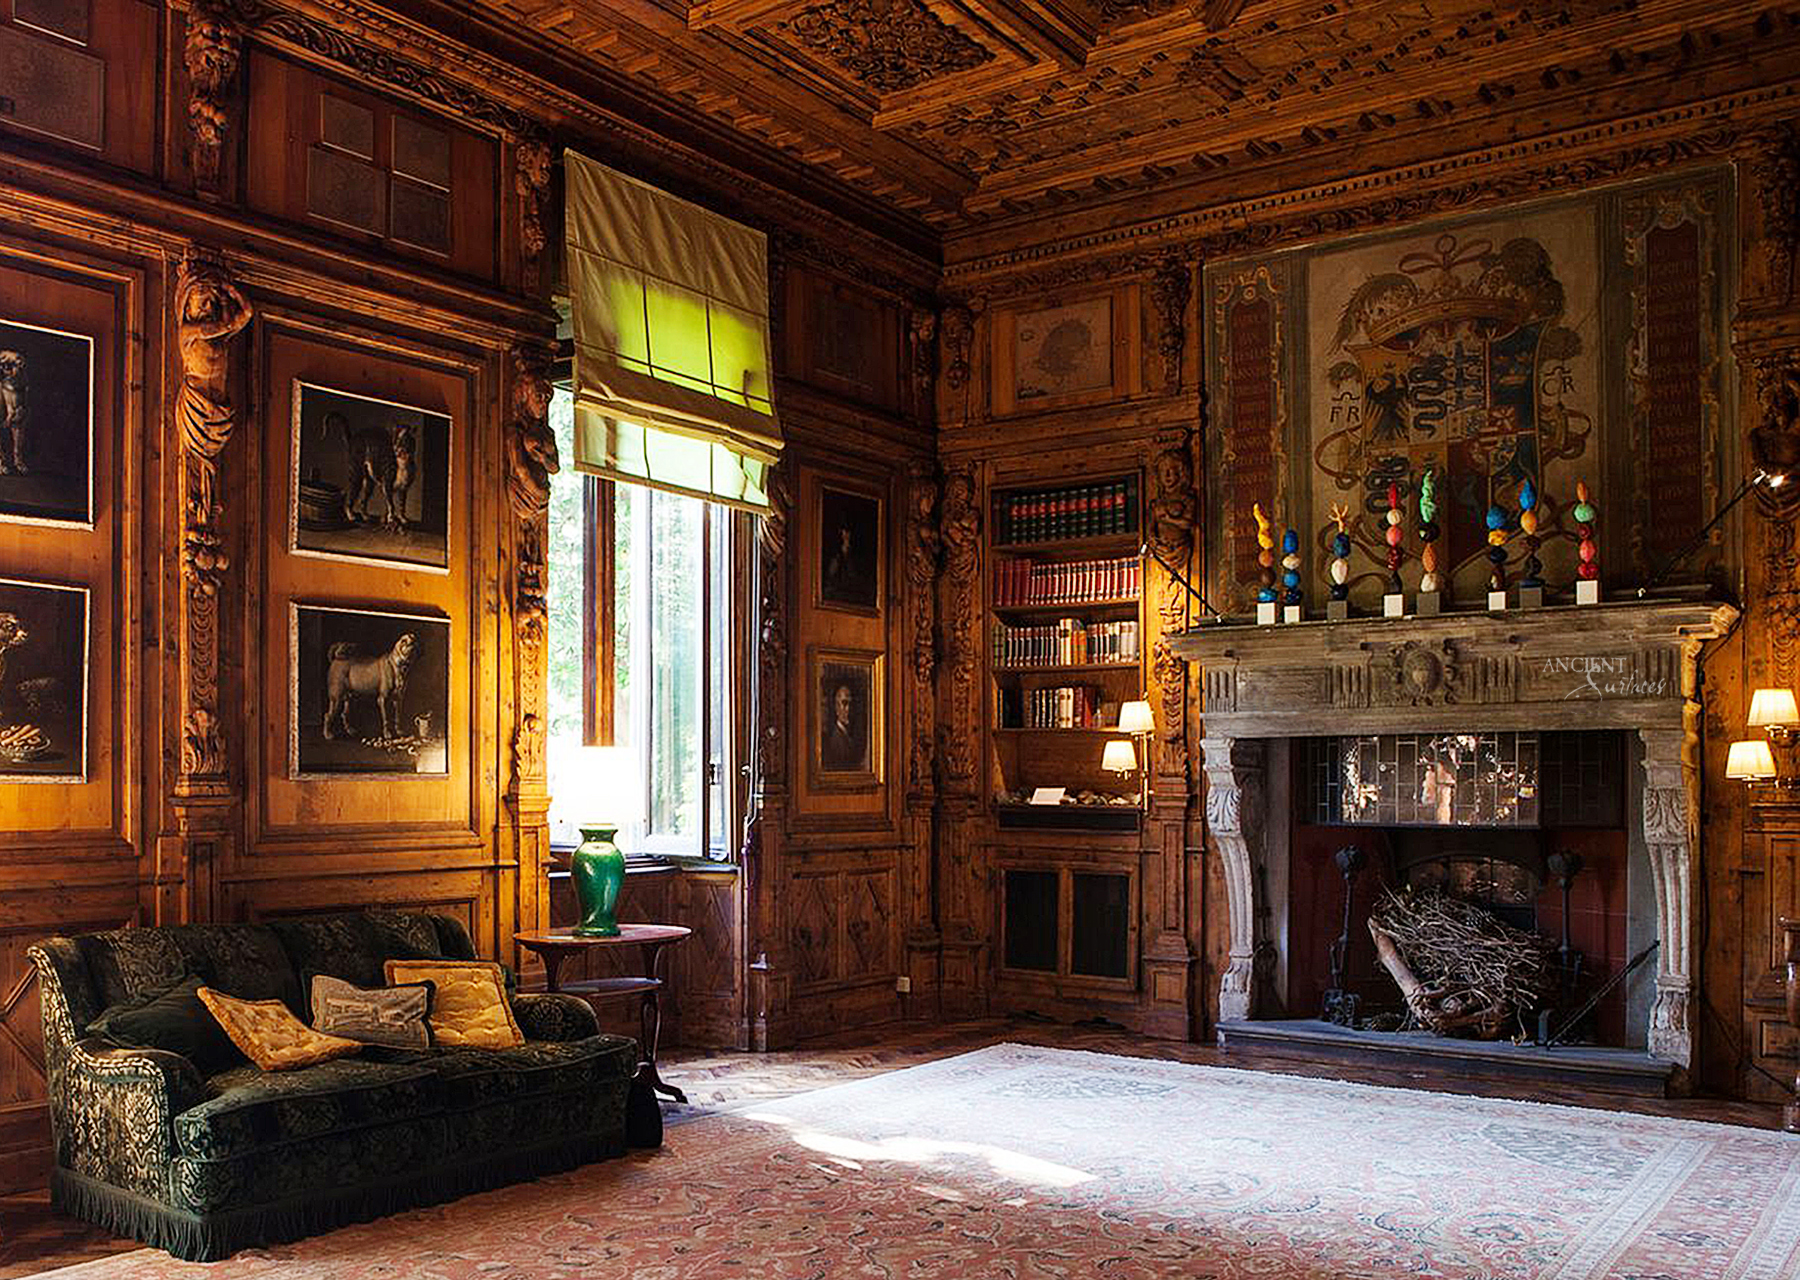 Edinburgh Antique Fireplaces